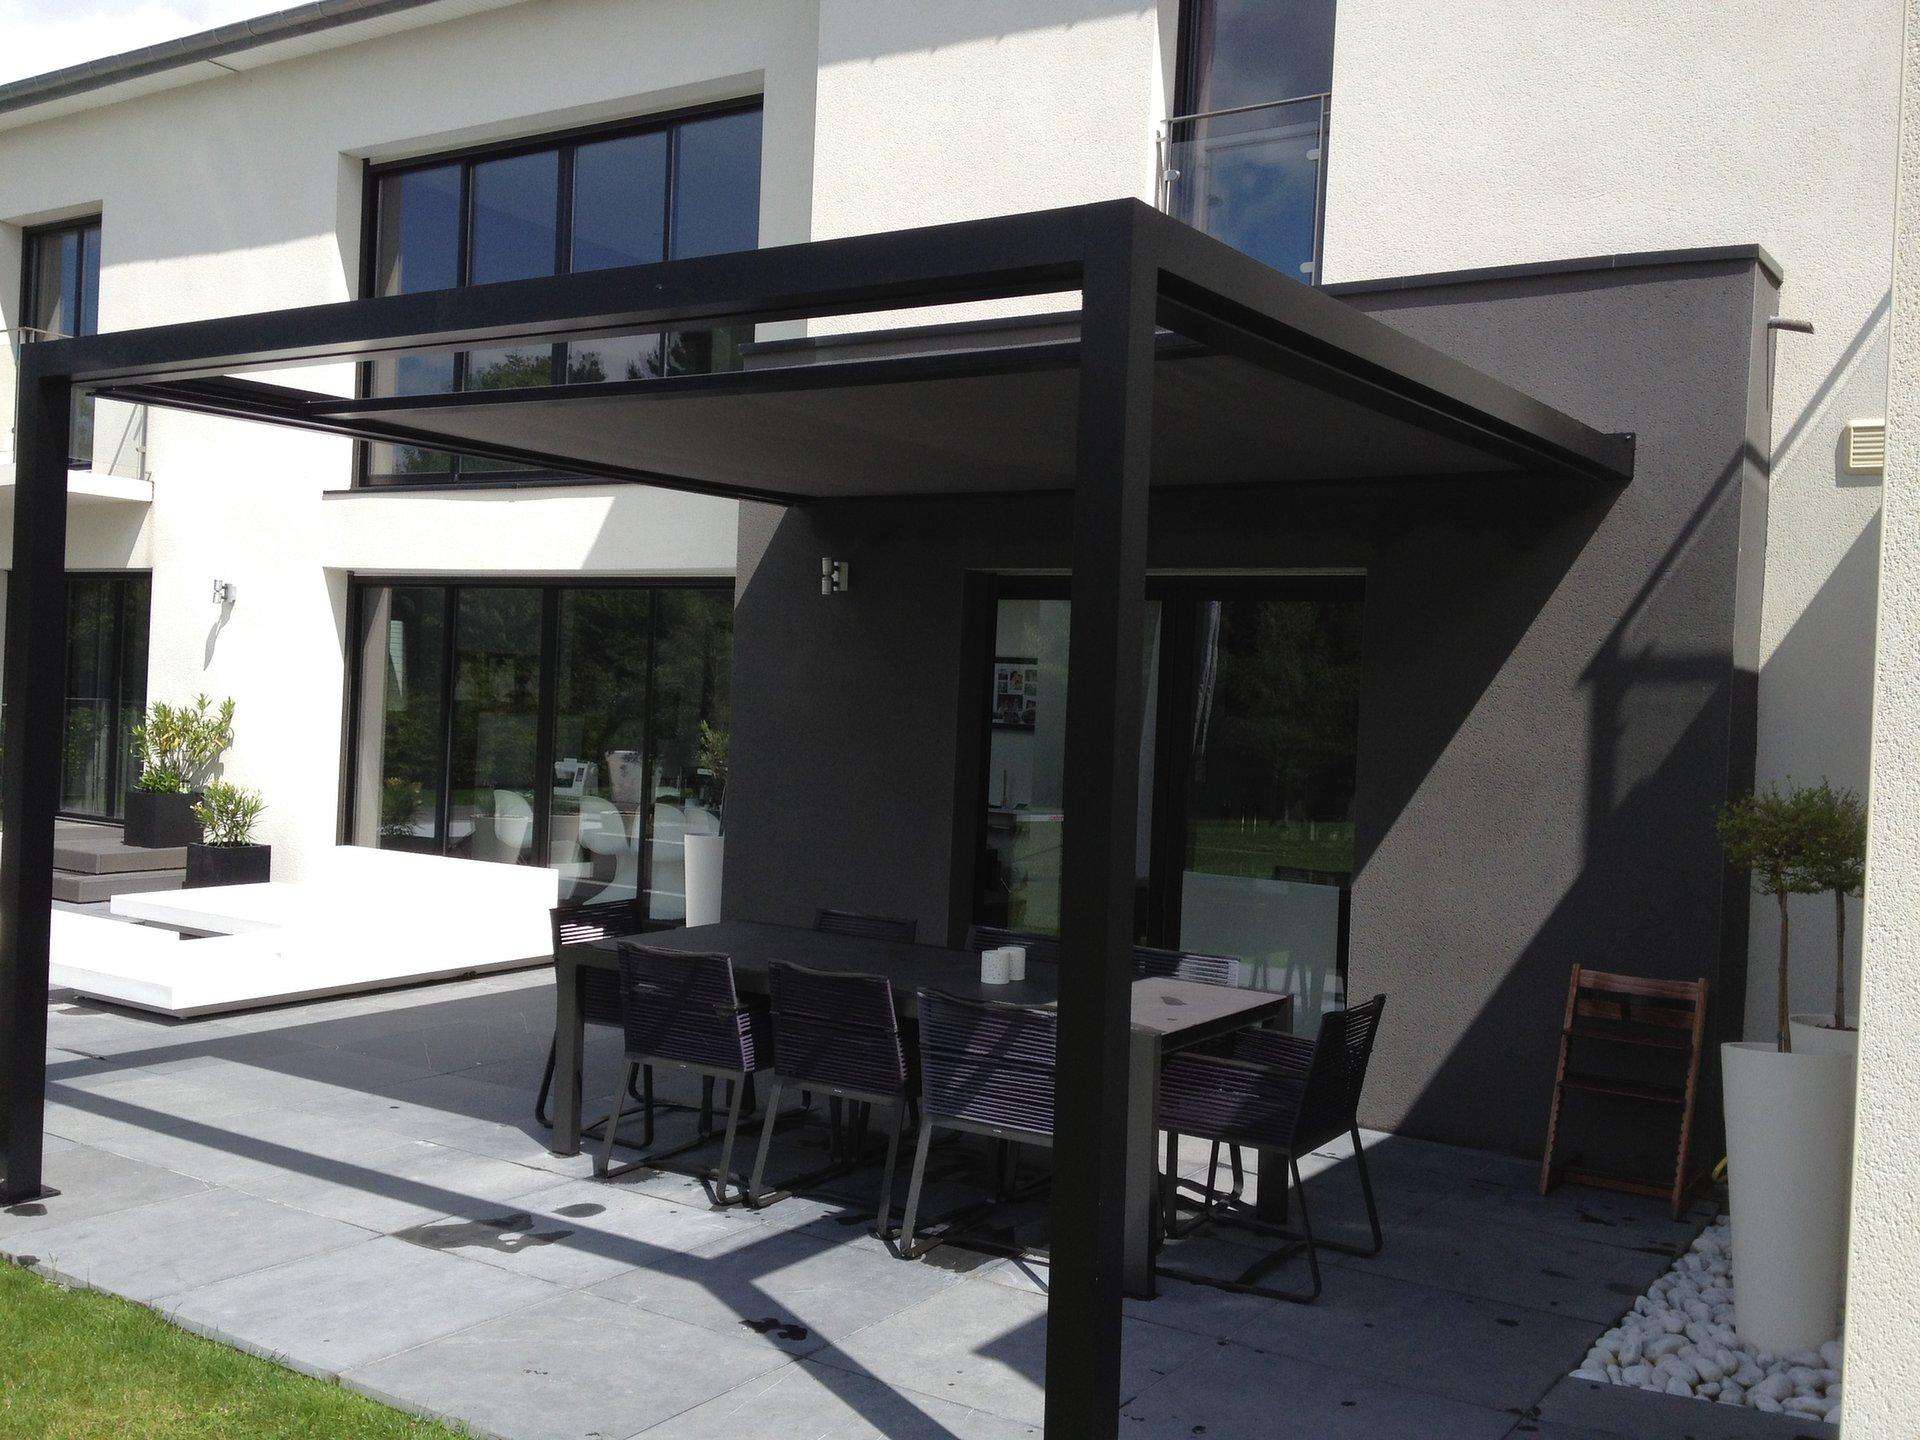 Ideea terrasse - Pergola ID2 Design